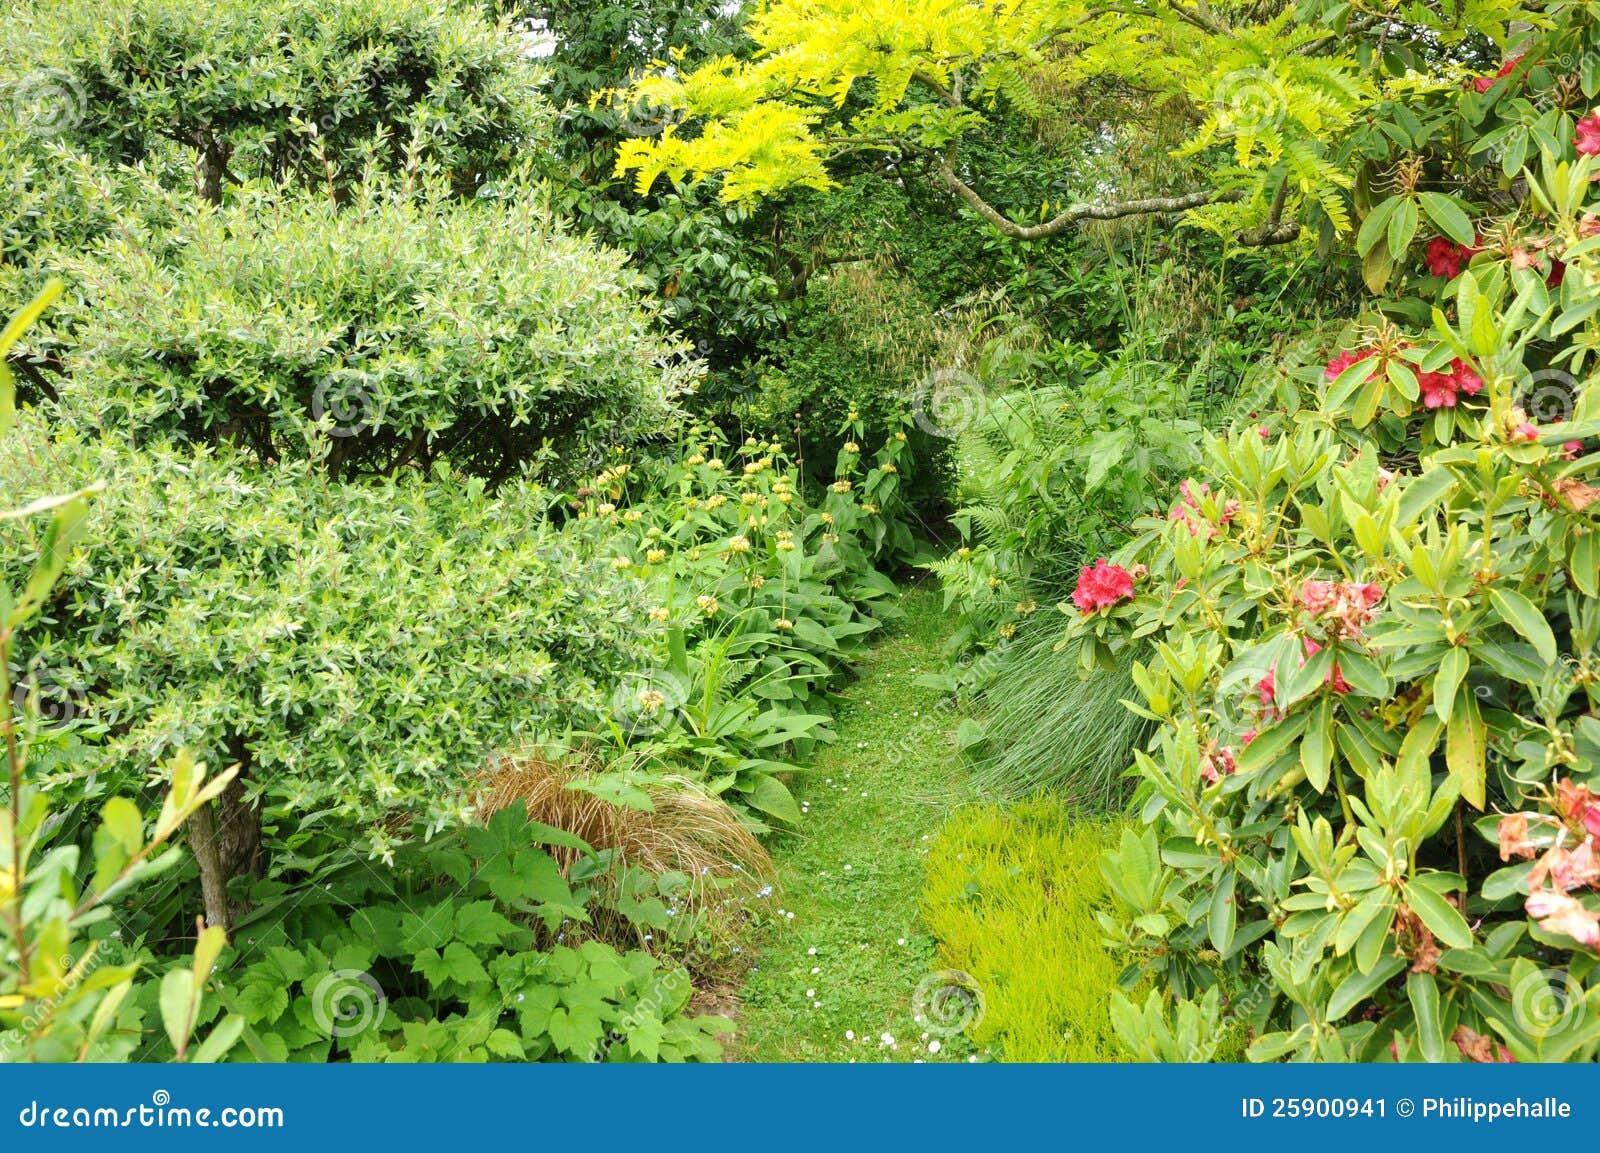 France le jardin de l atelier in perros guirec stock for Jardin en france